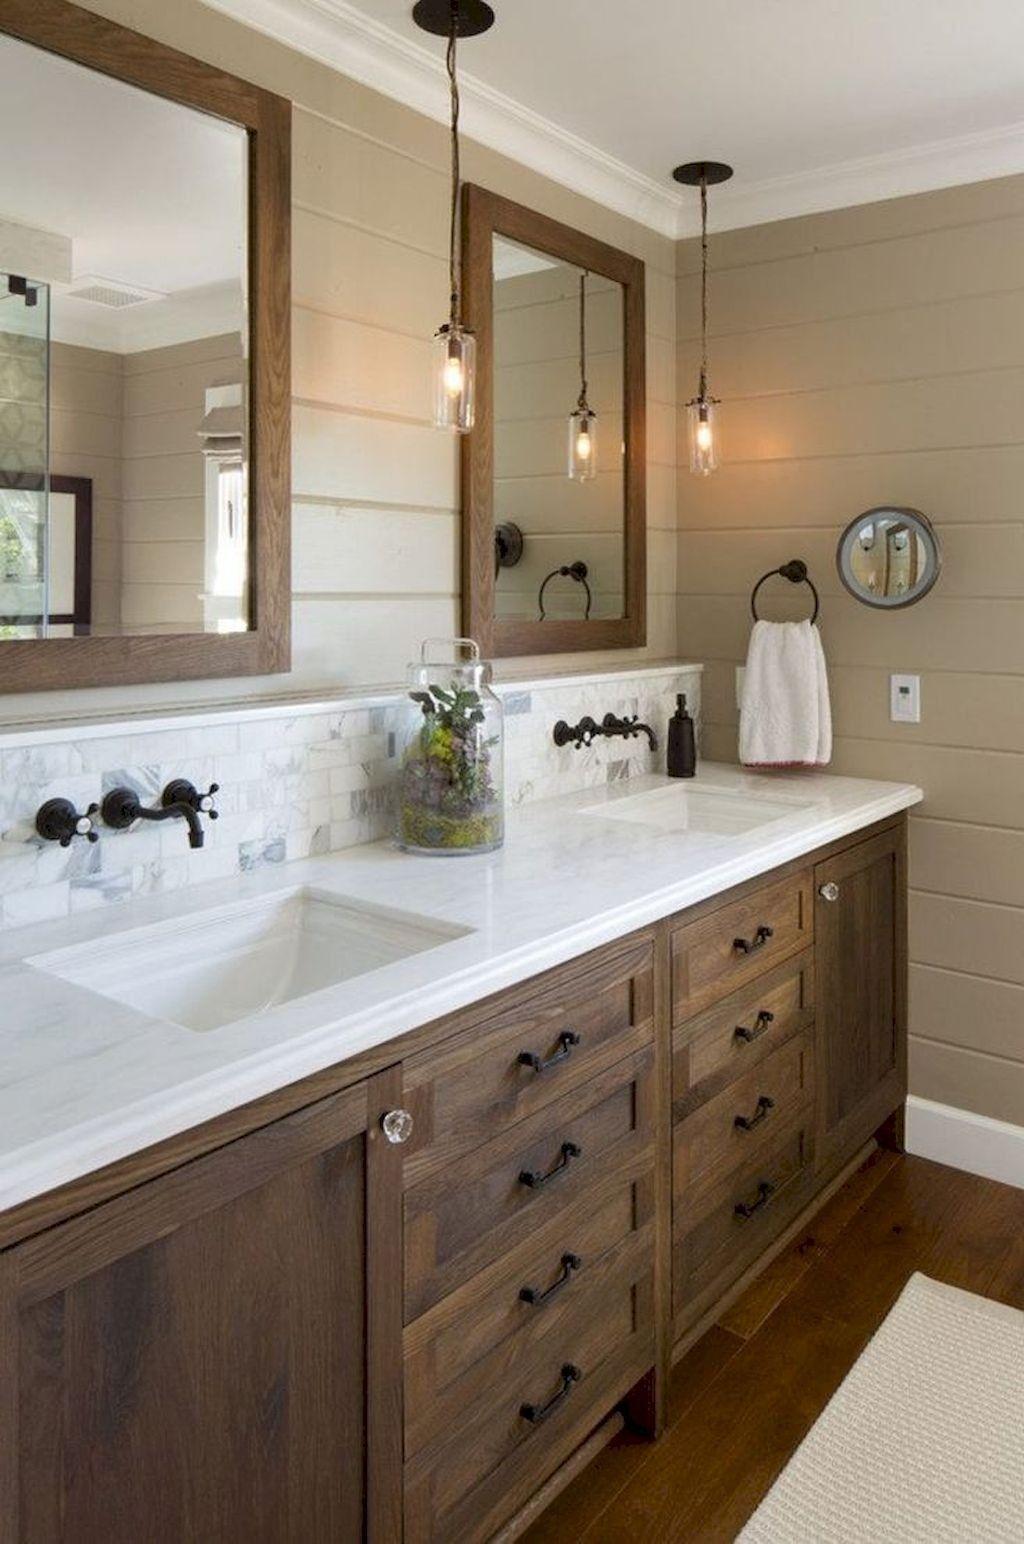 30 Awesome Master Bathroom Remodel Ideas On A Budget Bathroomdesignstyles Farmhouse Master Bathroom Bathrooms Remodel Master Bathroom Decor